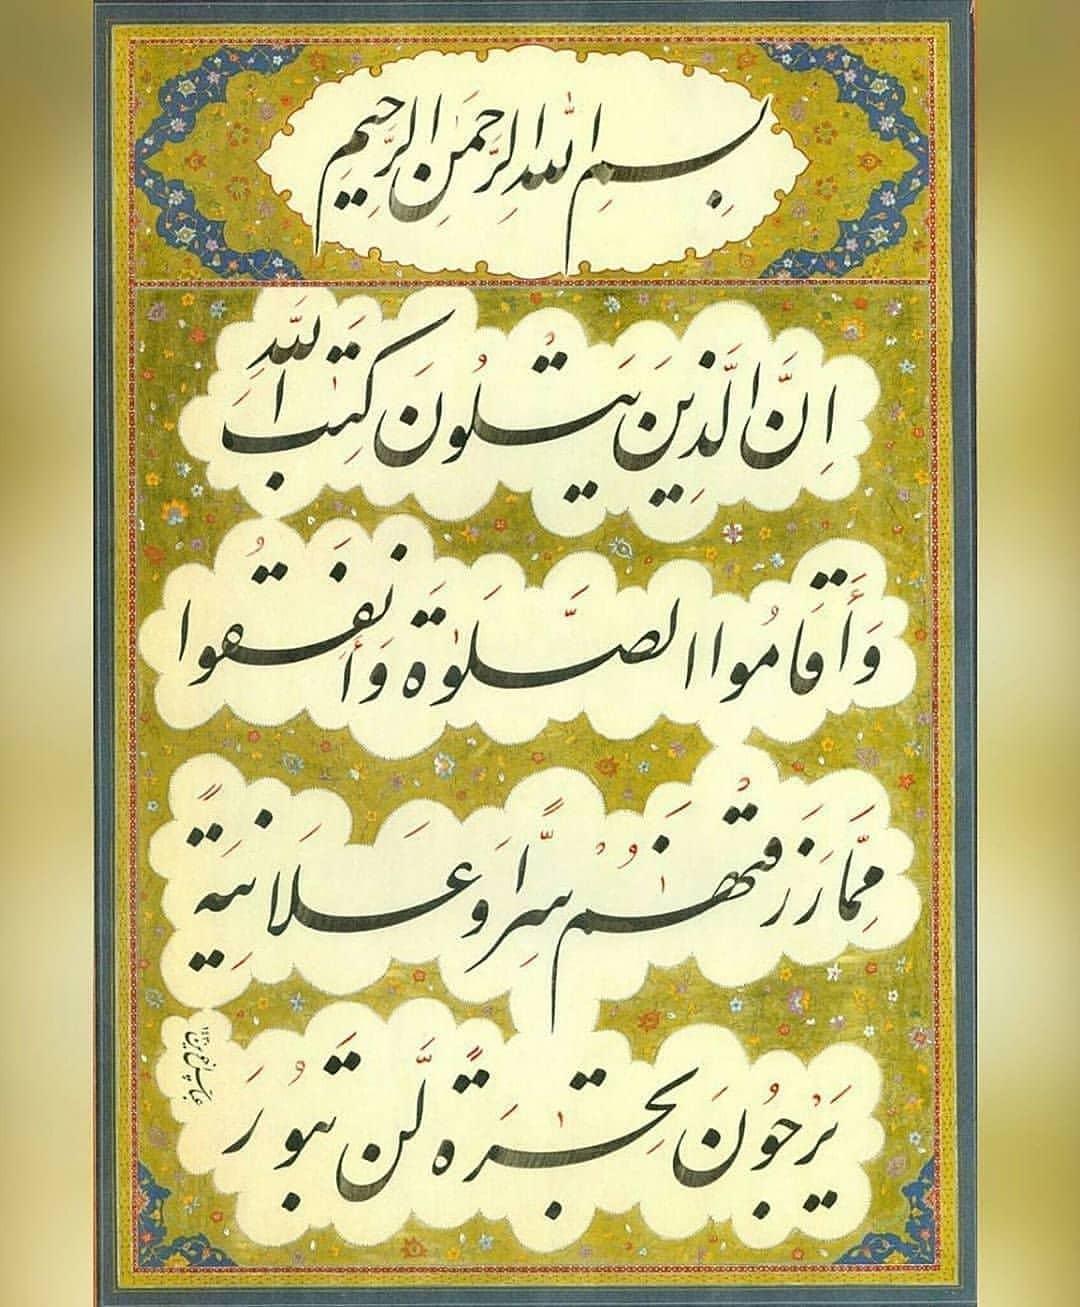 Download Photo Kaligrafi اثر زیبای استاد عباس اخوین . . . . . . . . . . . #زیبا  #قرآن  #اسلام  #هنر #هنر…- Vahedi Masoud